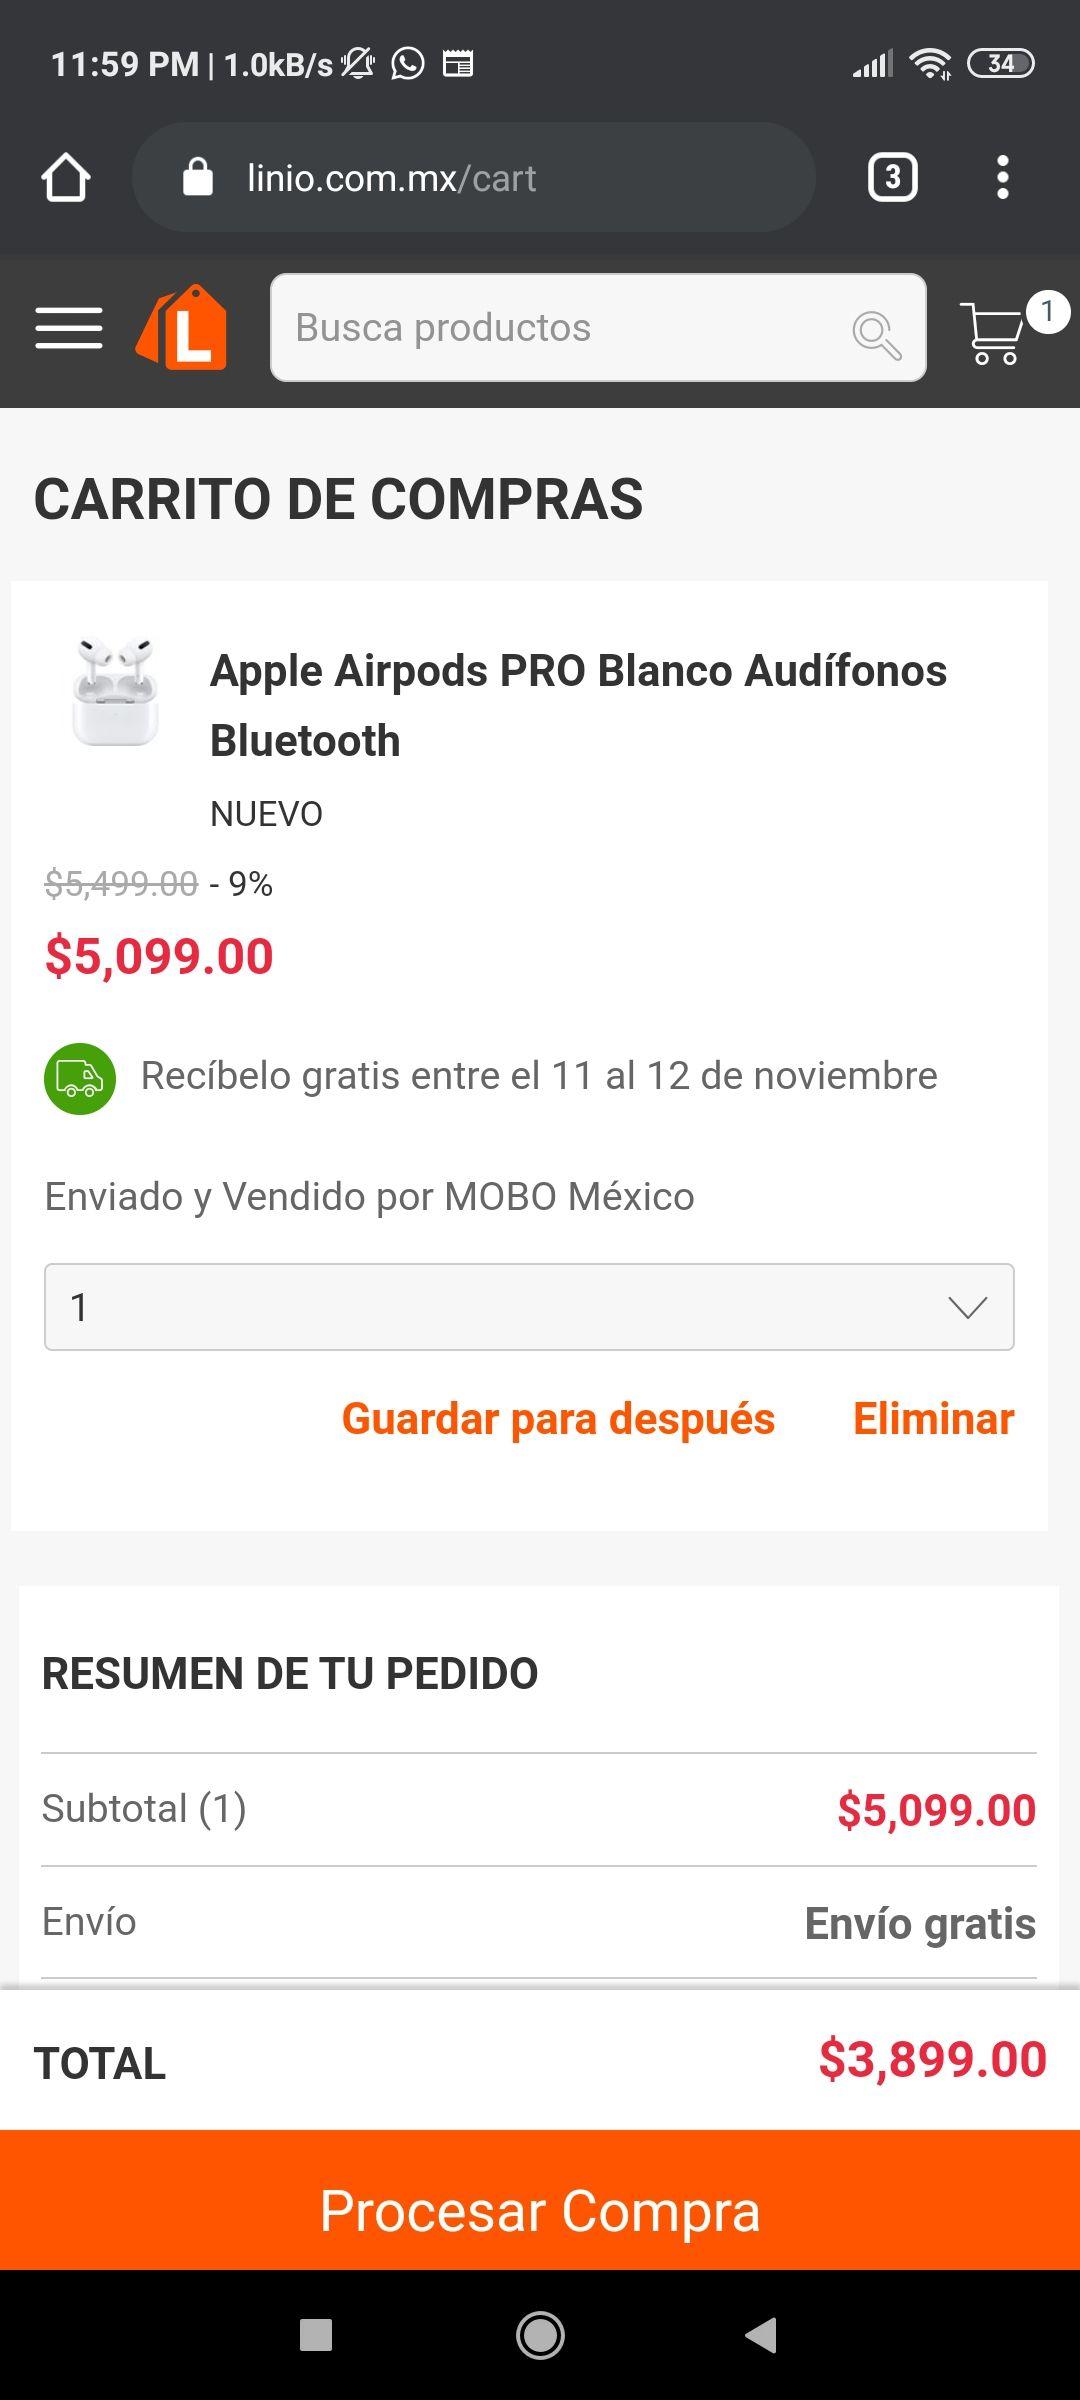 Linio Airpods Pro $3,899 pagando con Scotiabank Debito